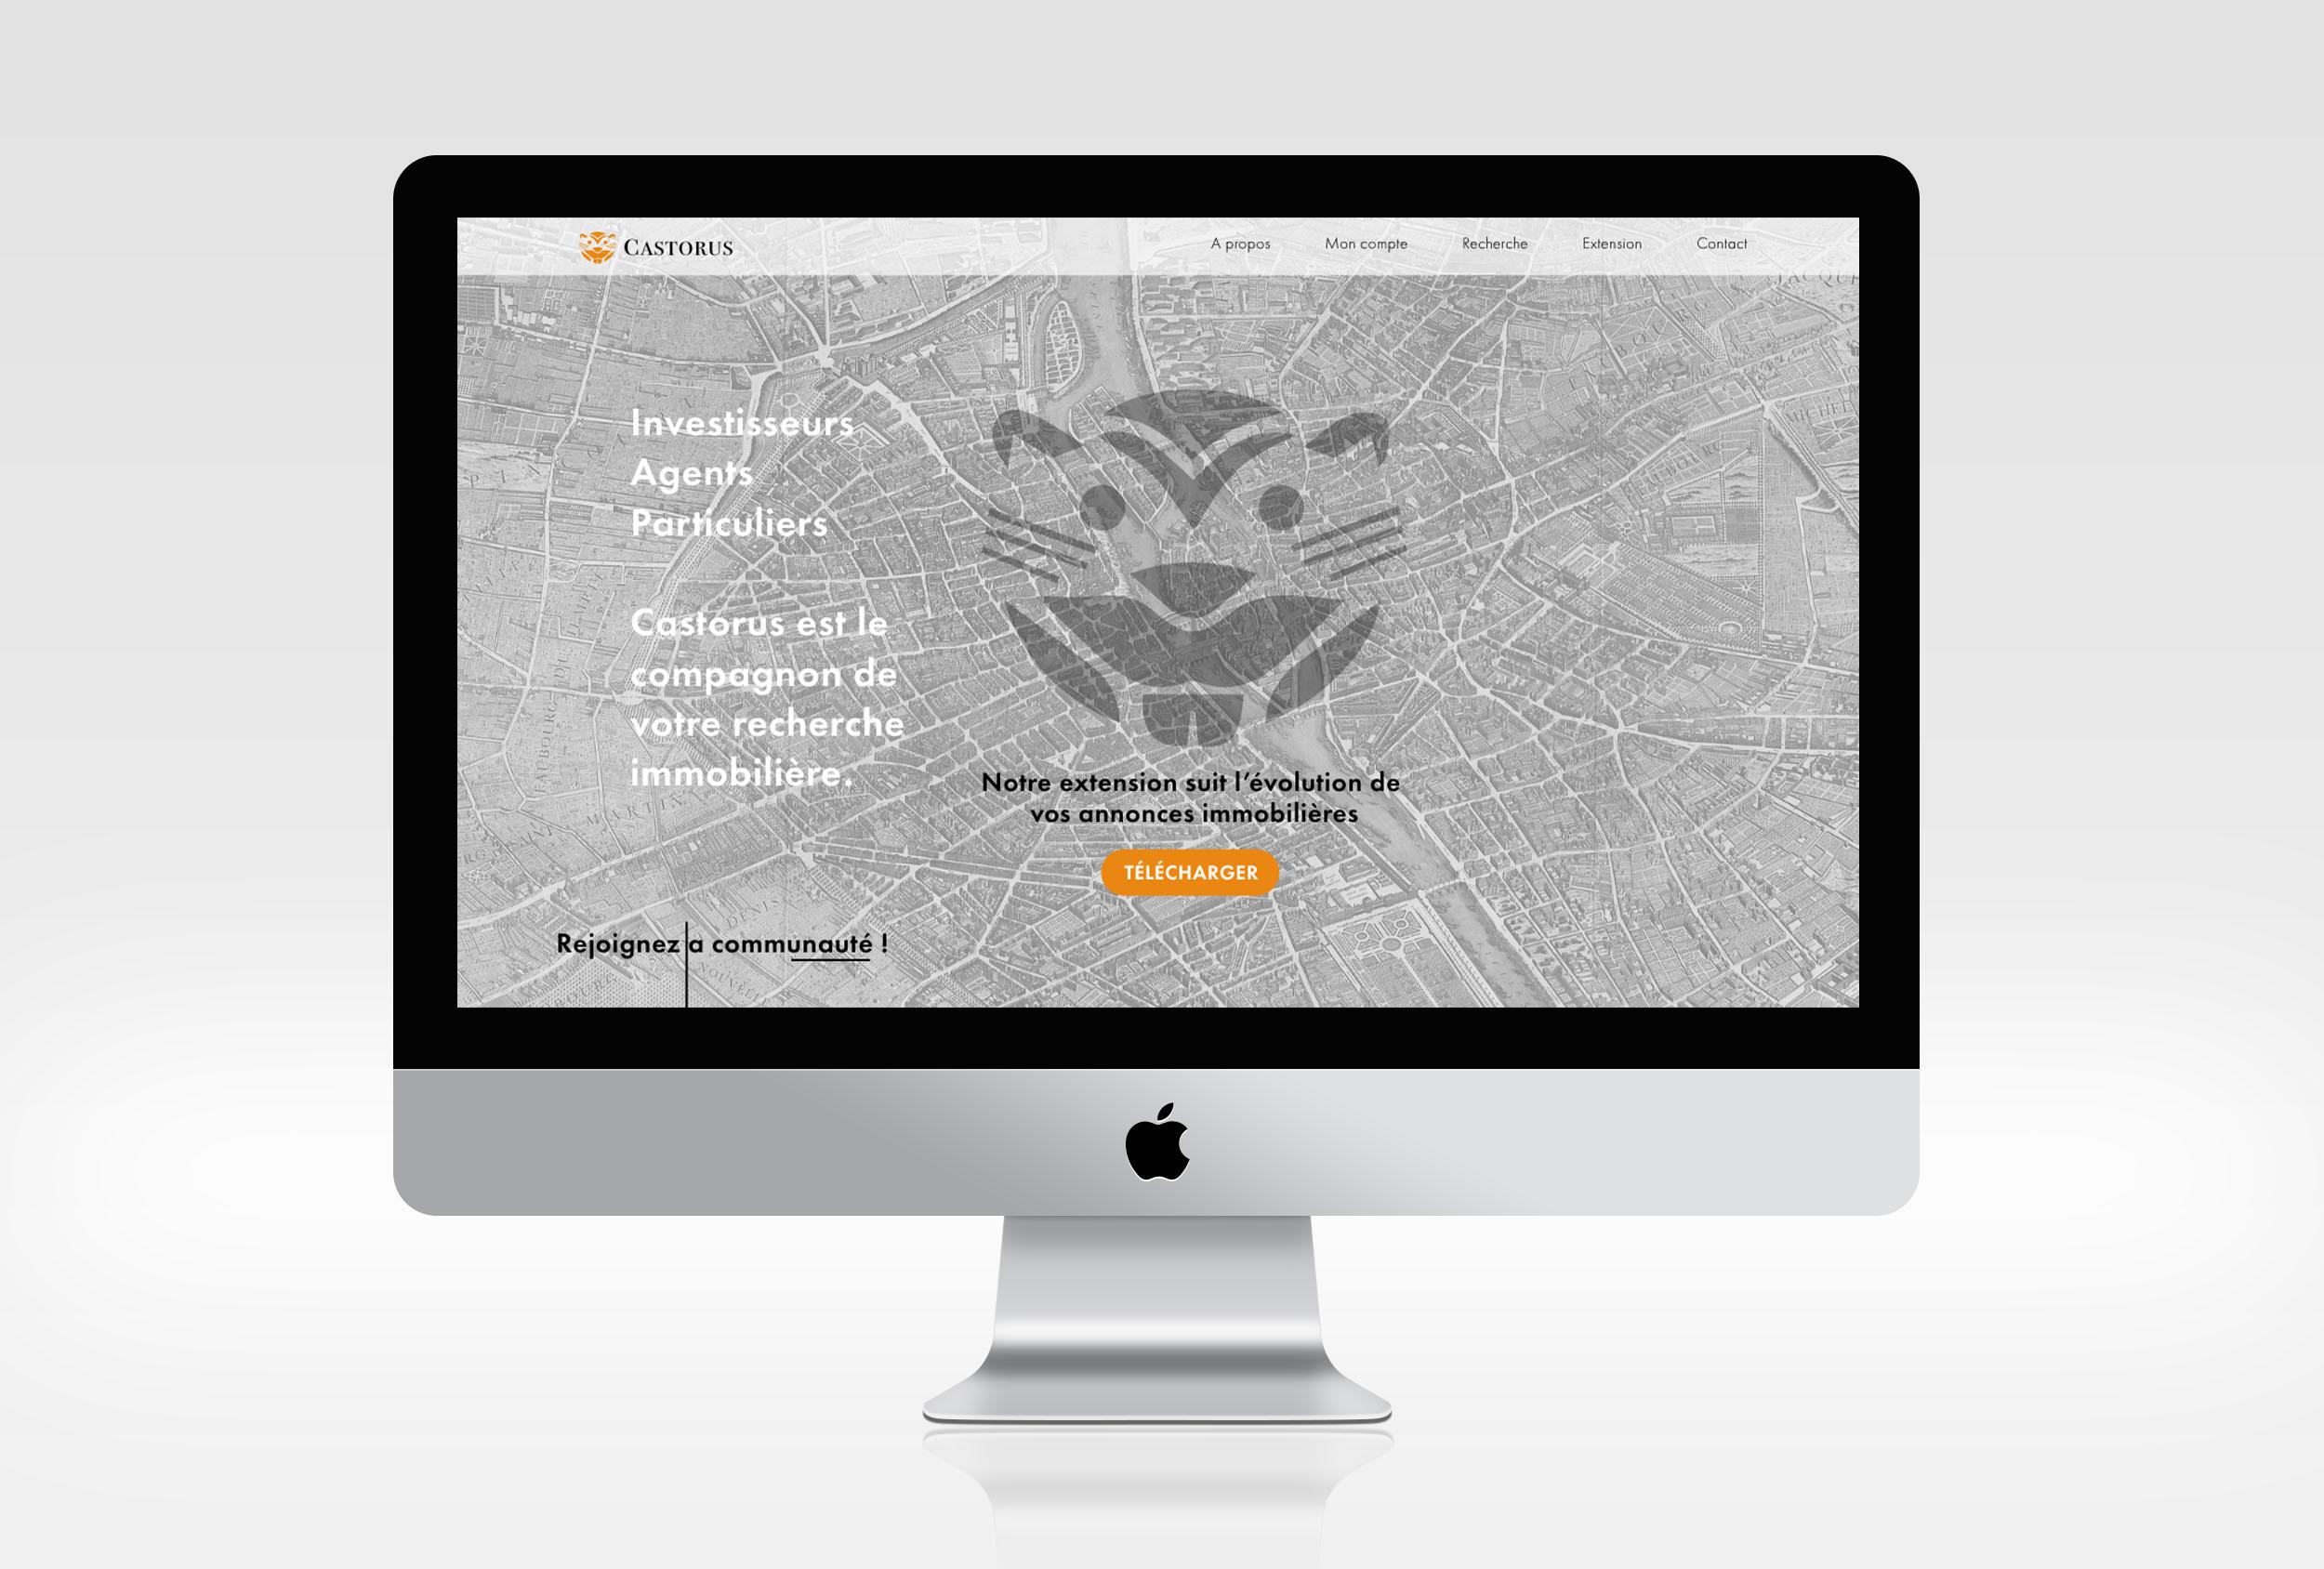 julien-guichard-digital-webmaster-biarritz-refonte